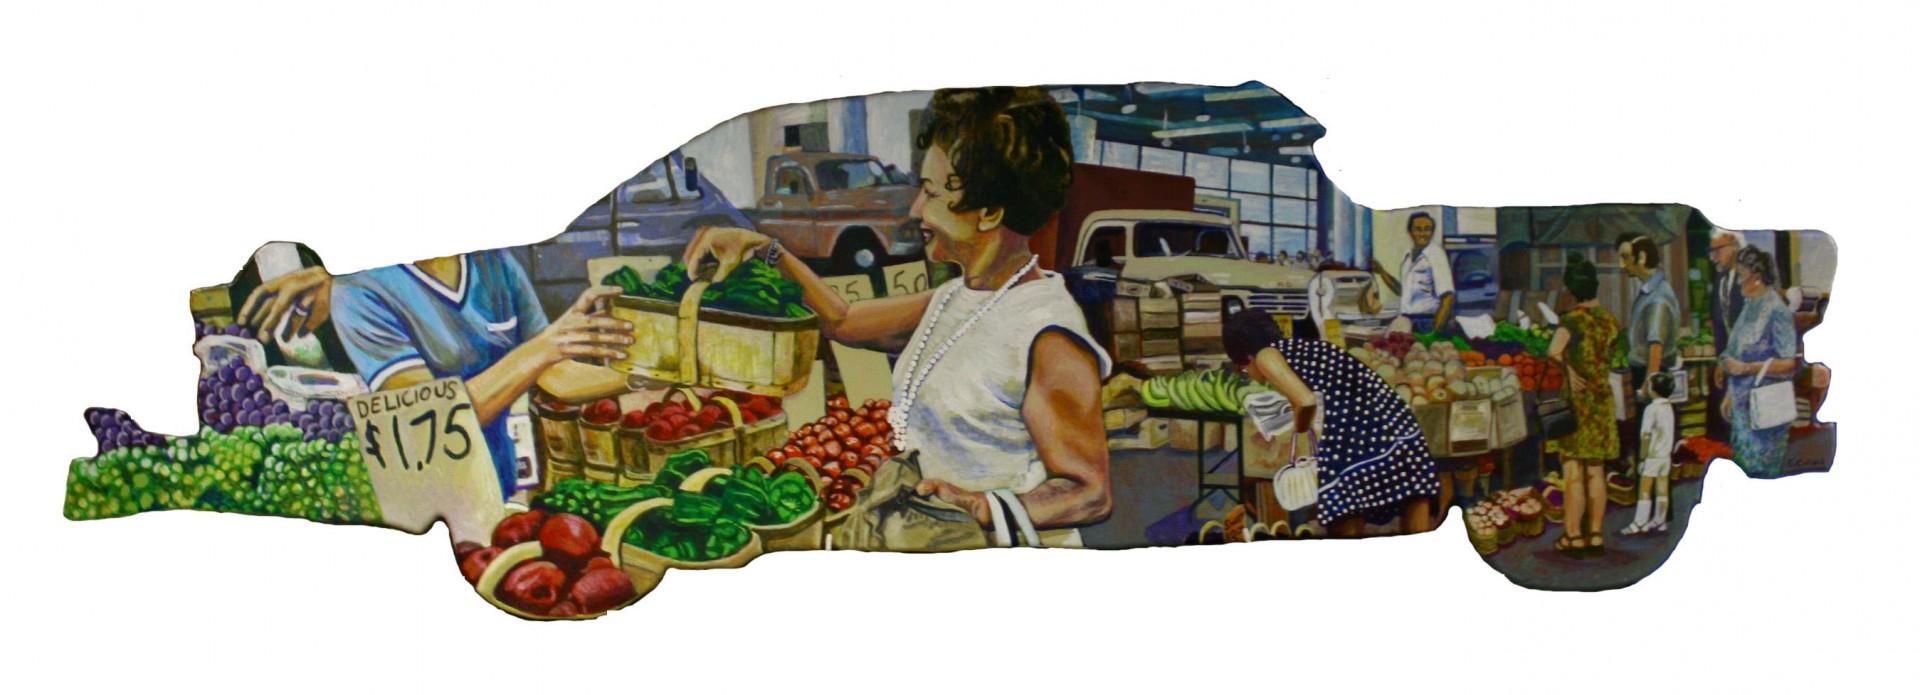 Market Memory, by Sara Collard